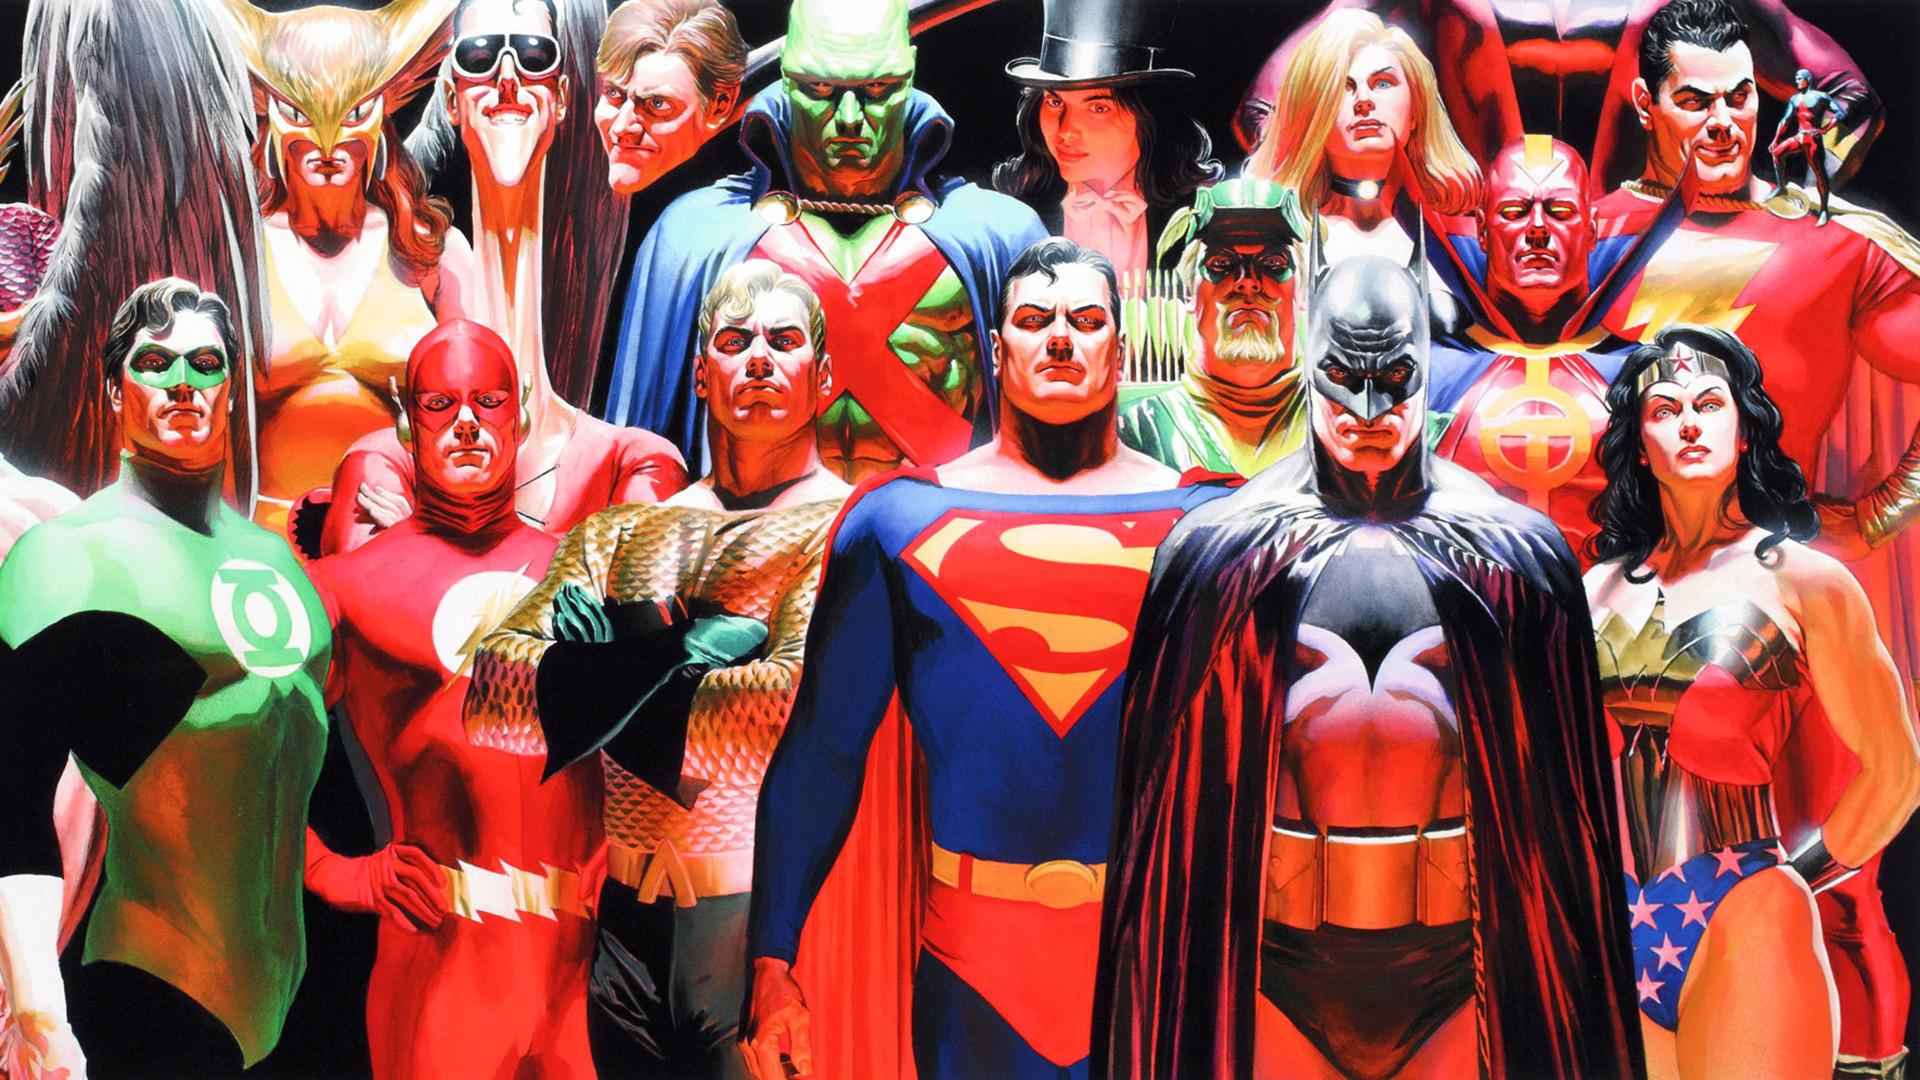 1920x1080 Justice League of America